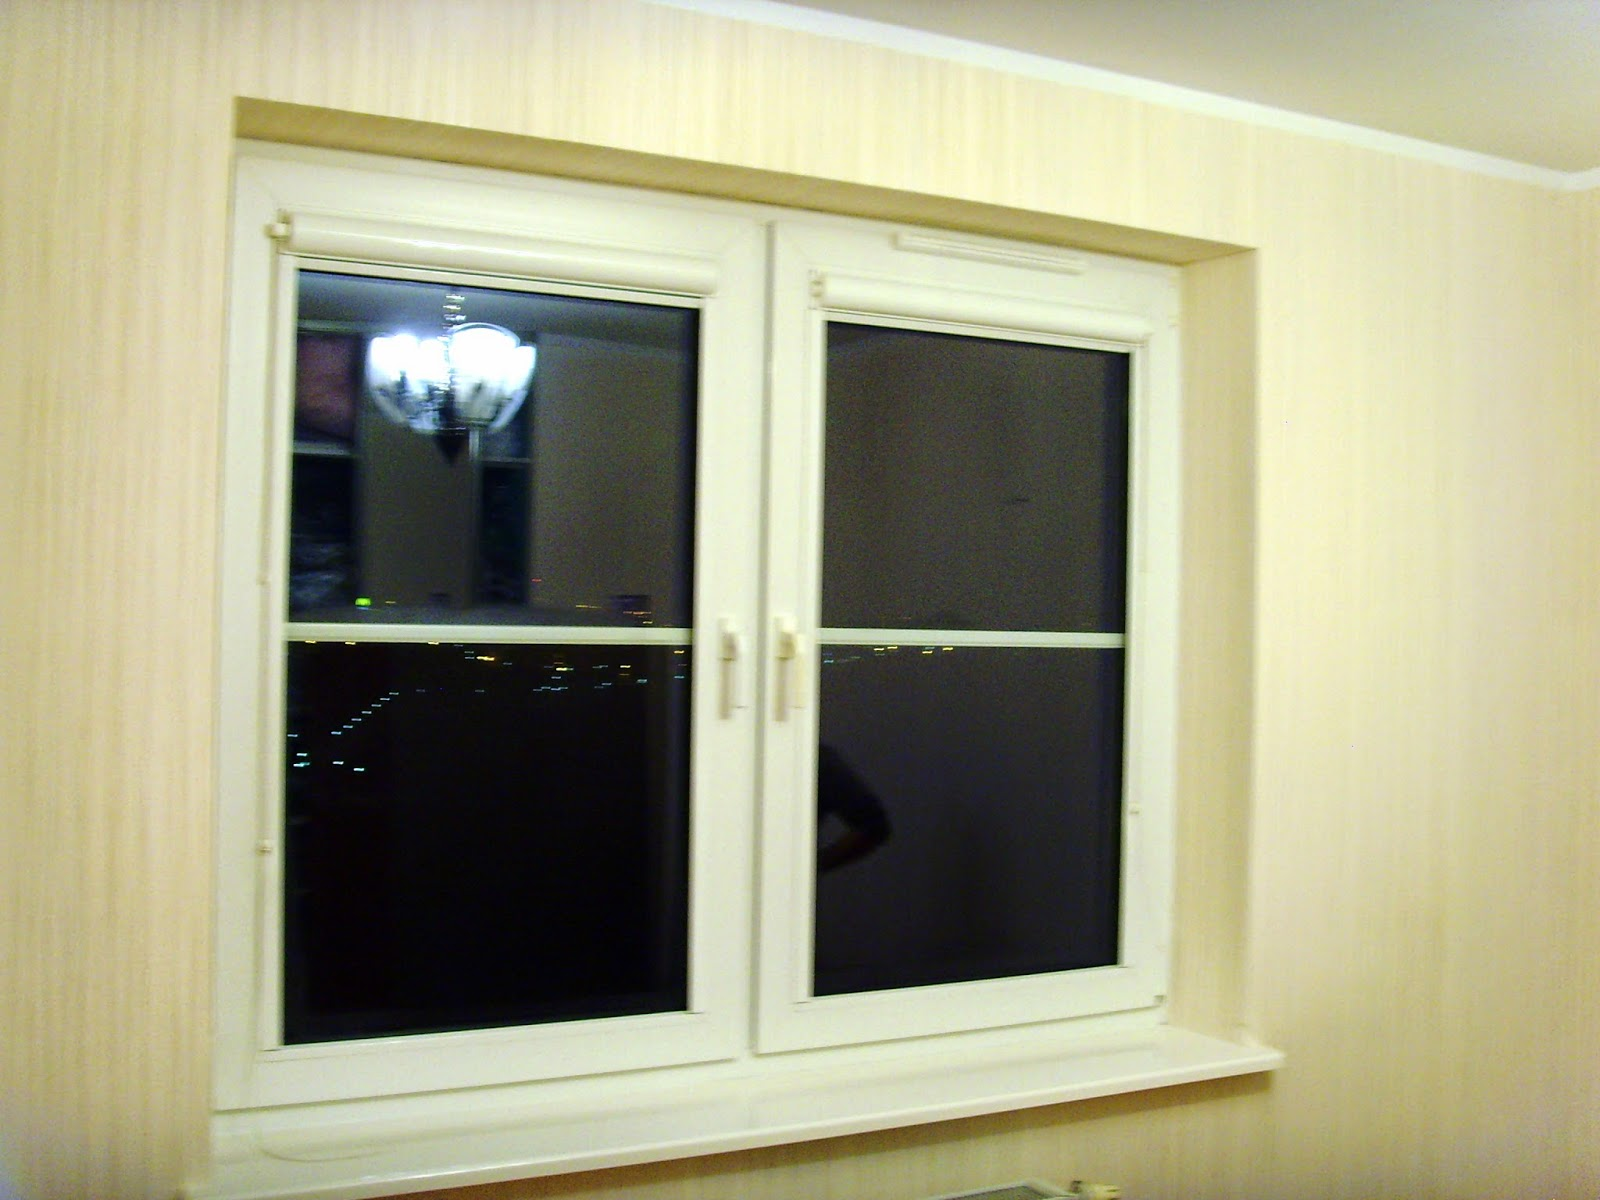 tapeta w pokoju obrobiona wokół okna